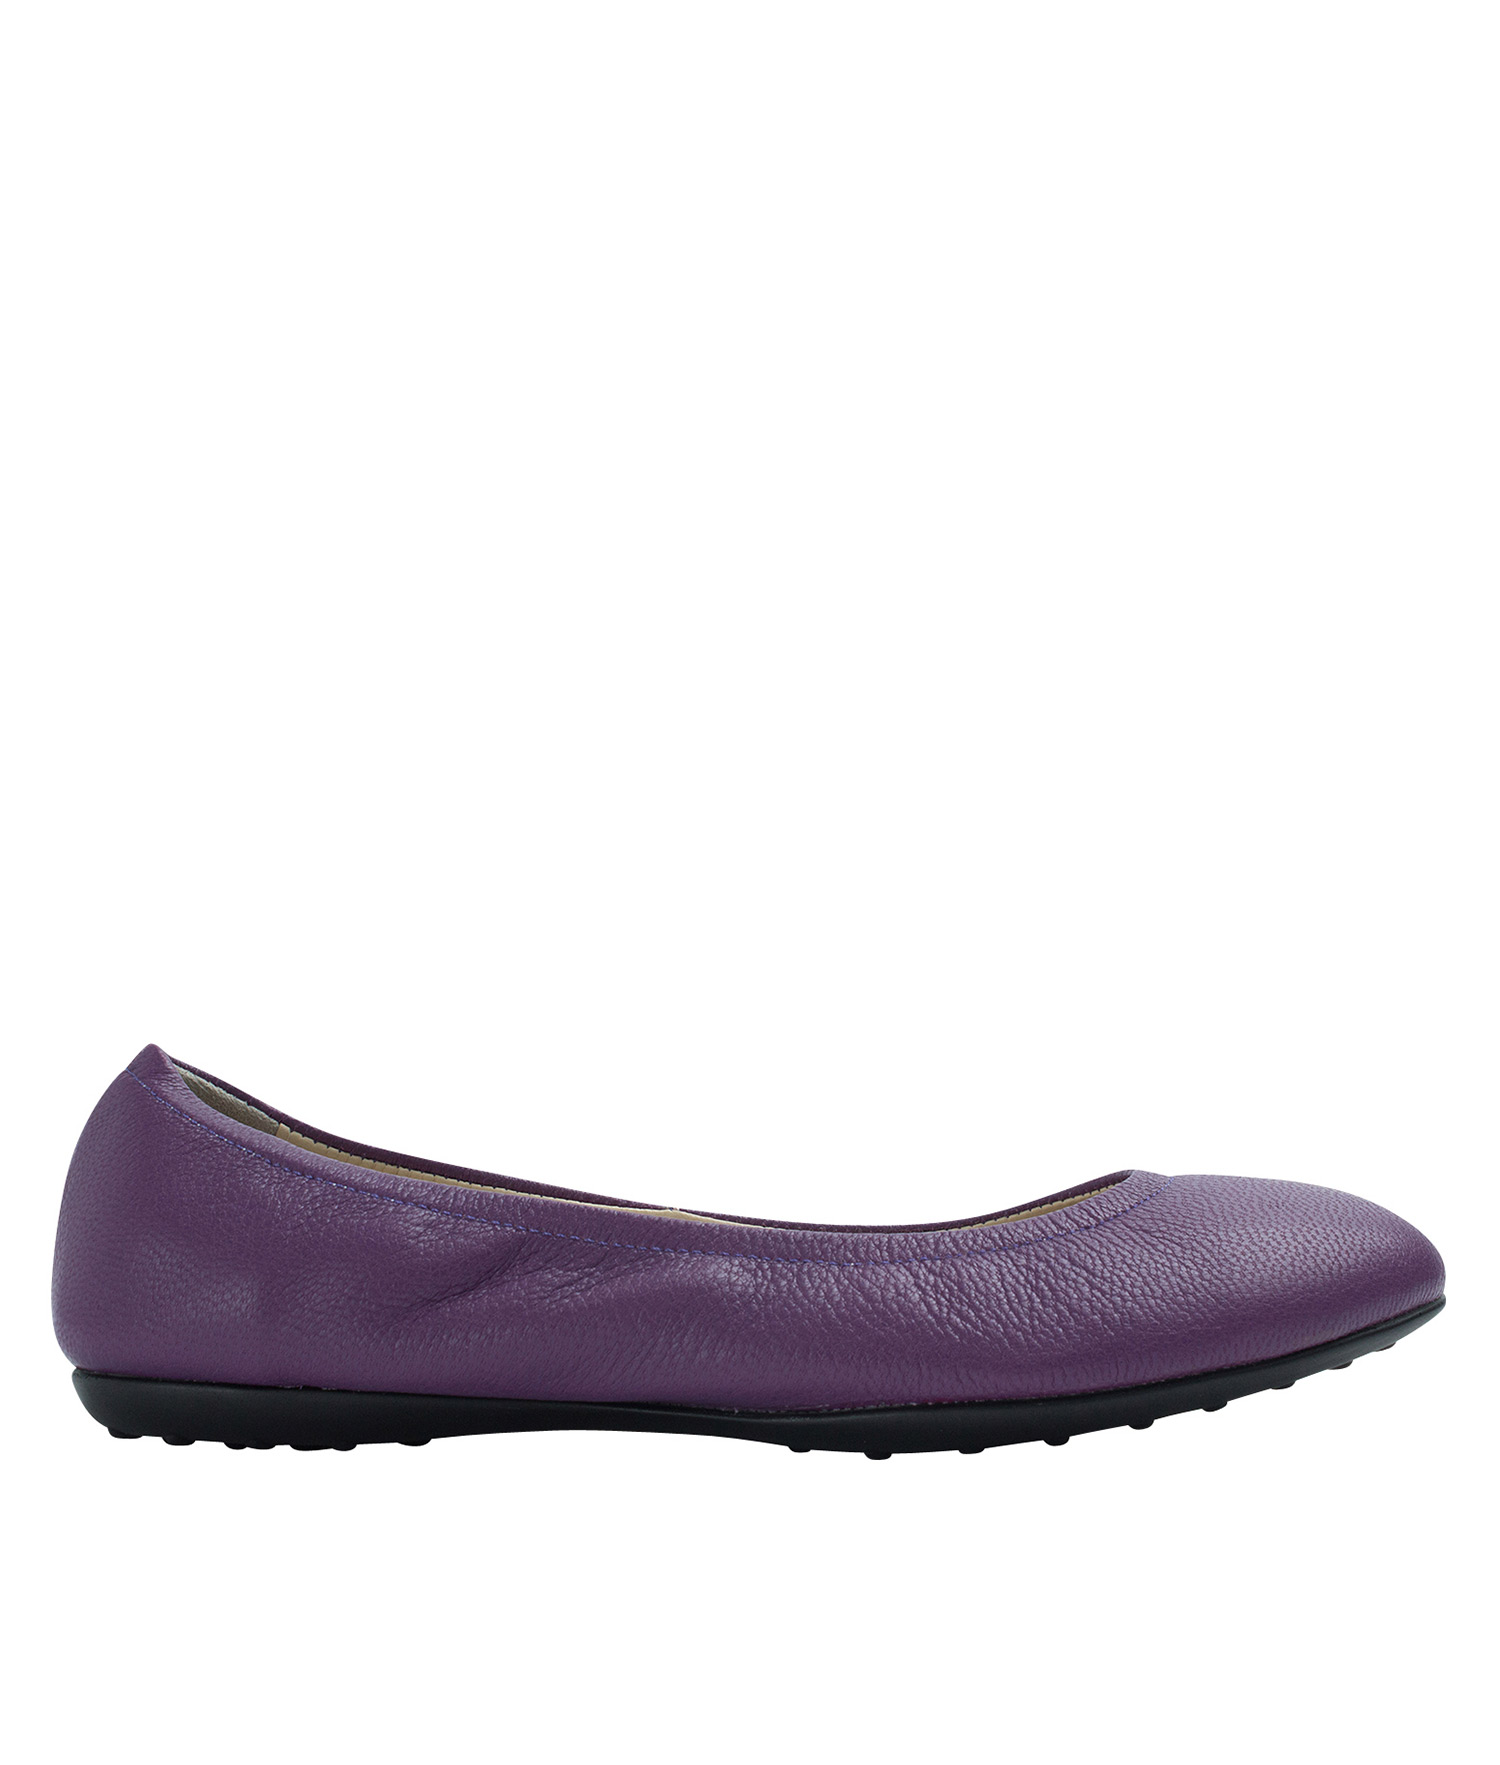 7416cf168d03 Annakastle Womens Genuine Leather Elastic Ballerina Flats Purple